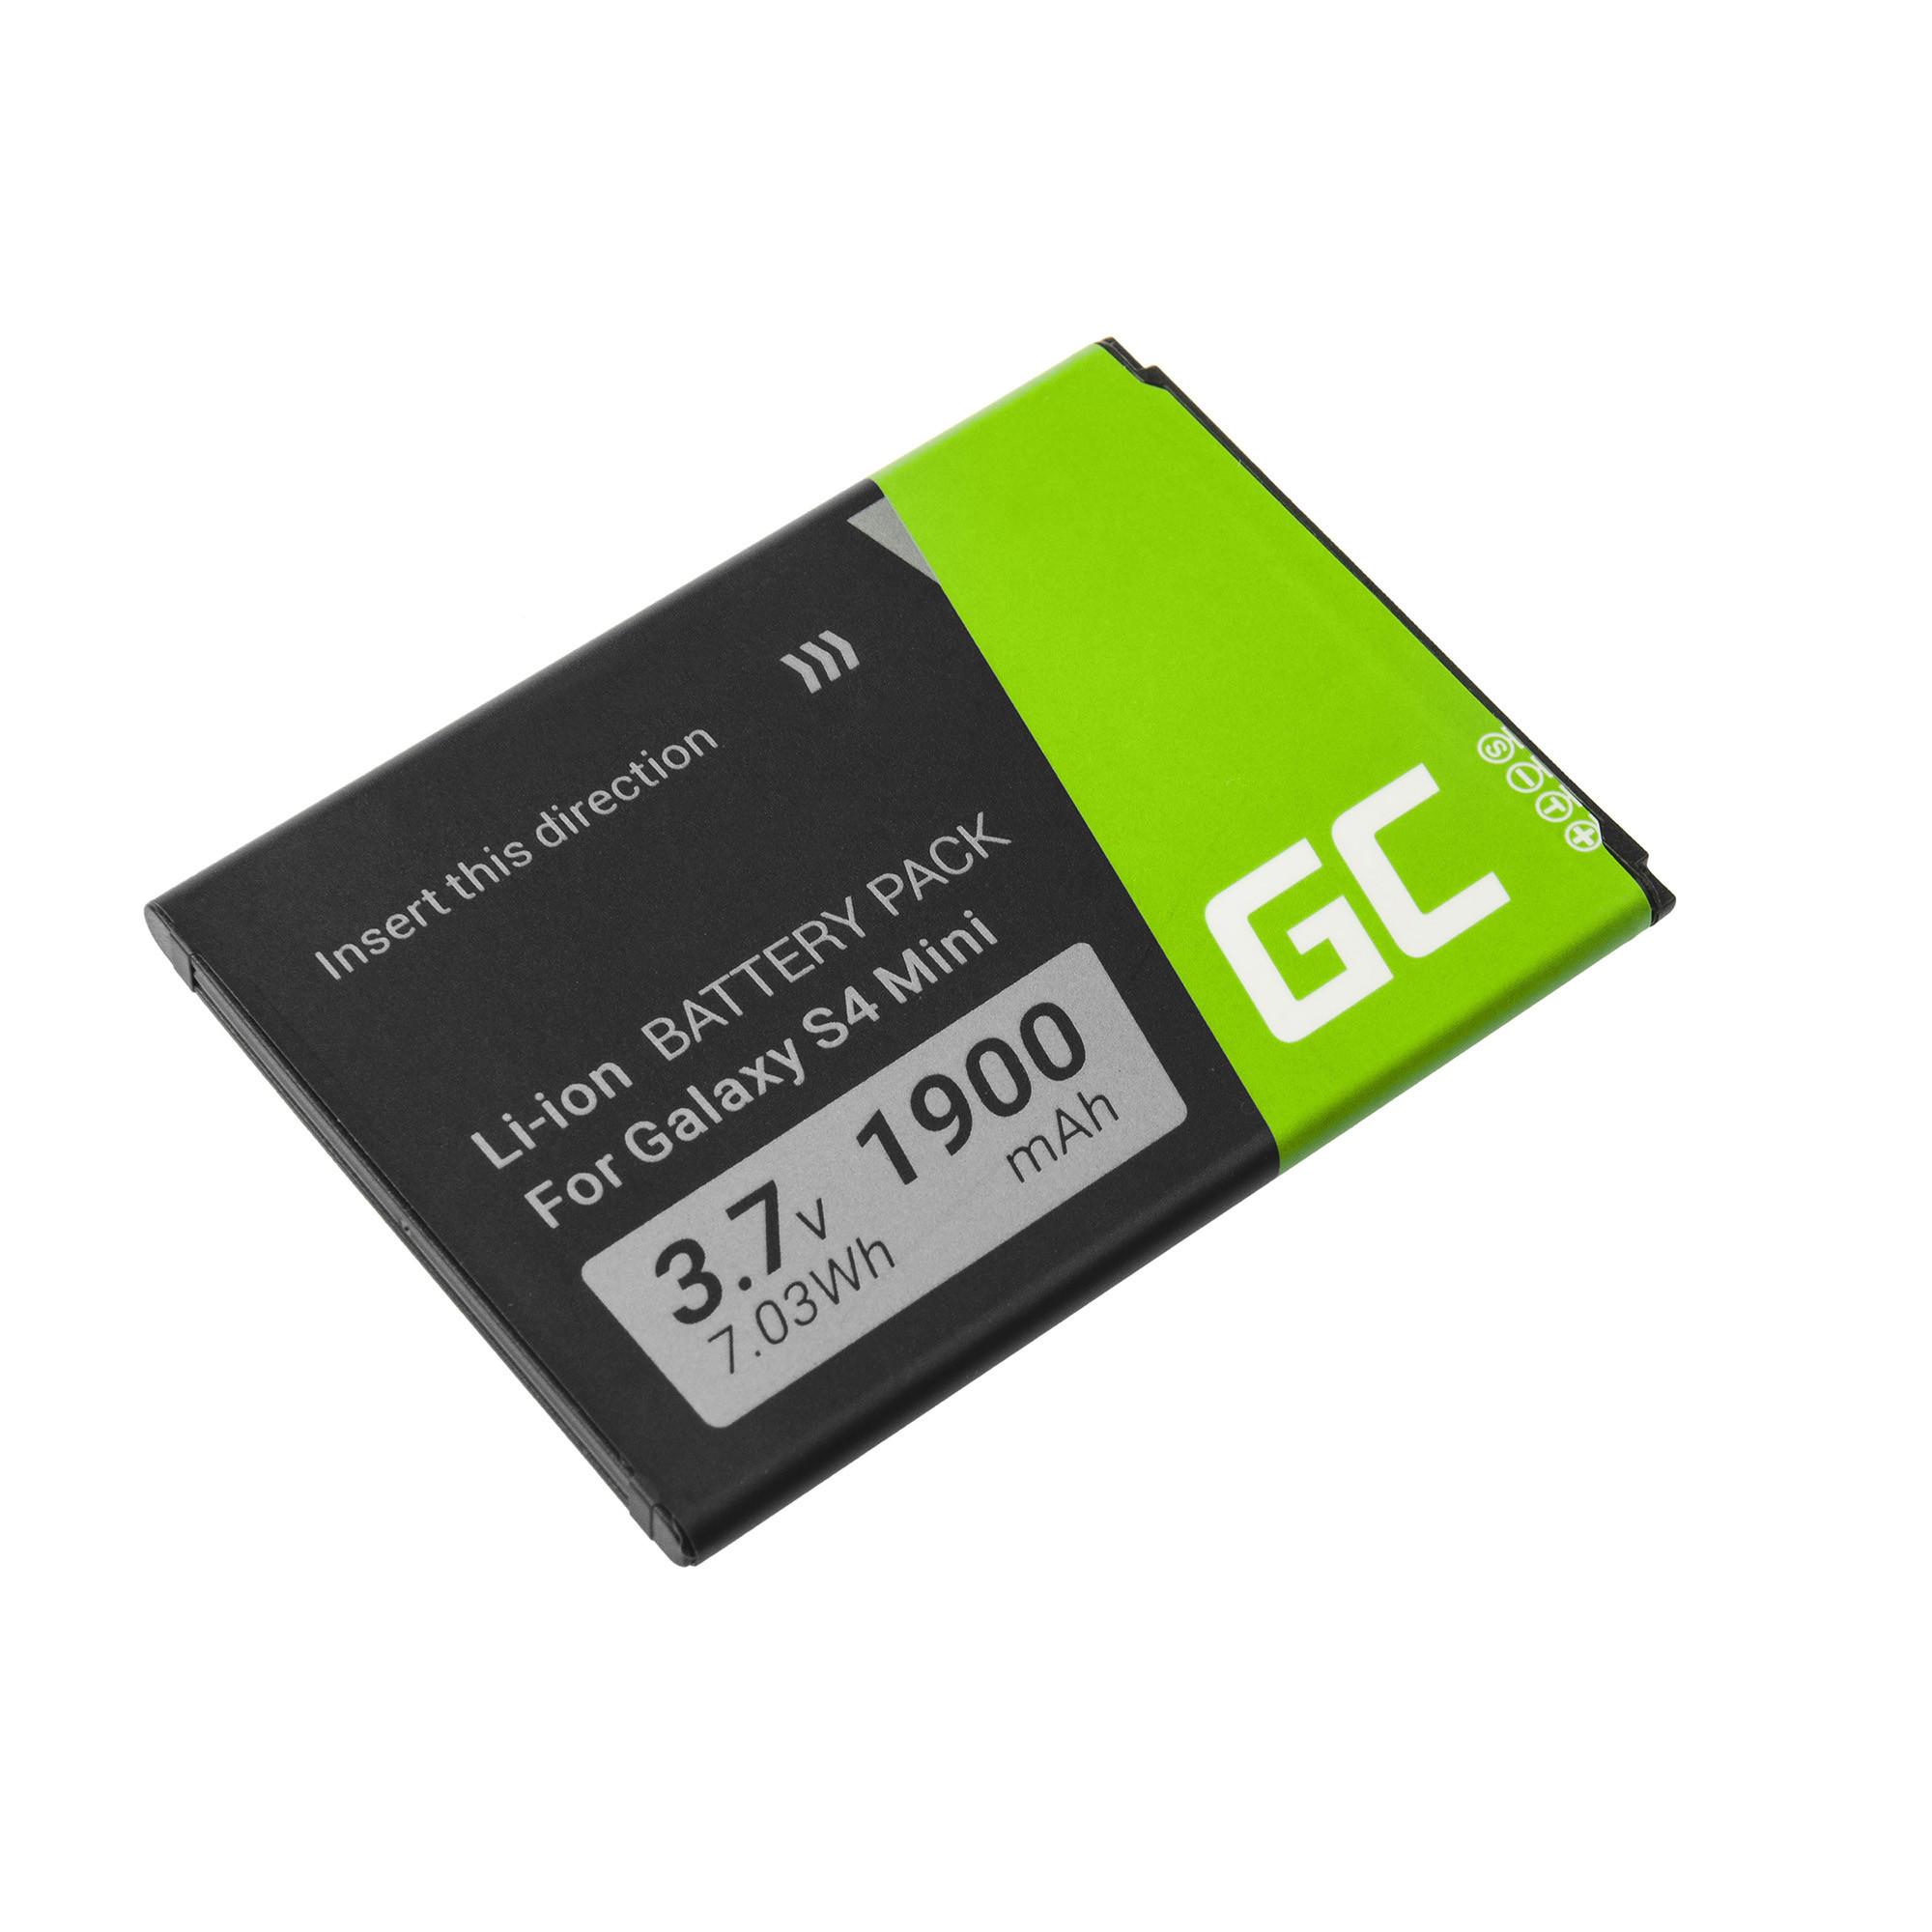 Baterie Green Cell Samsung B500BE Samsung Galaxy S4 Mini 1900mAh Li-ion - neoriginální